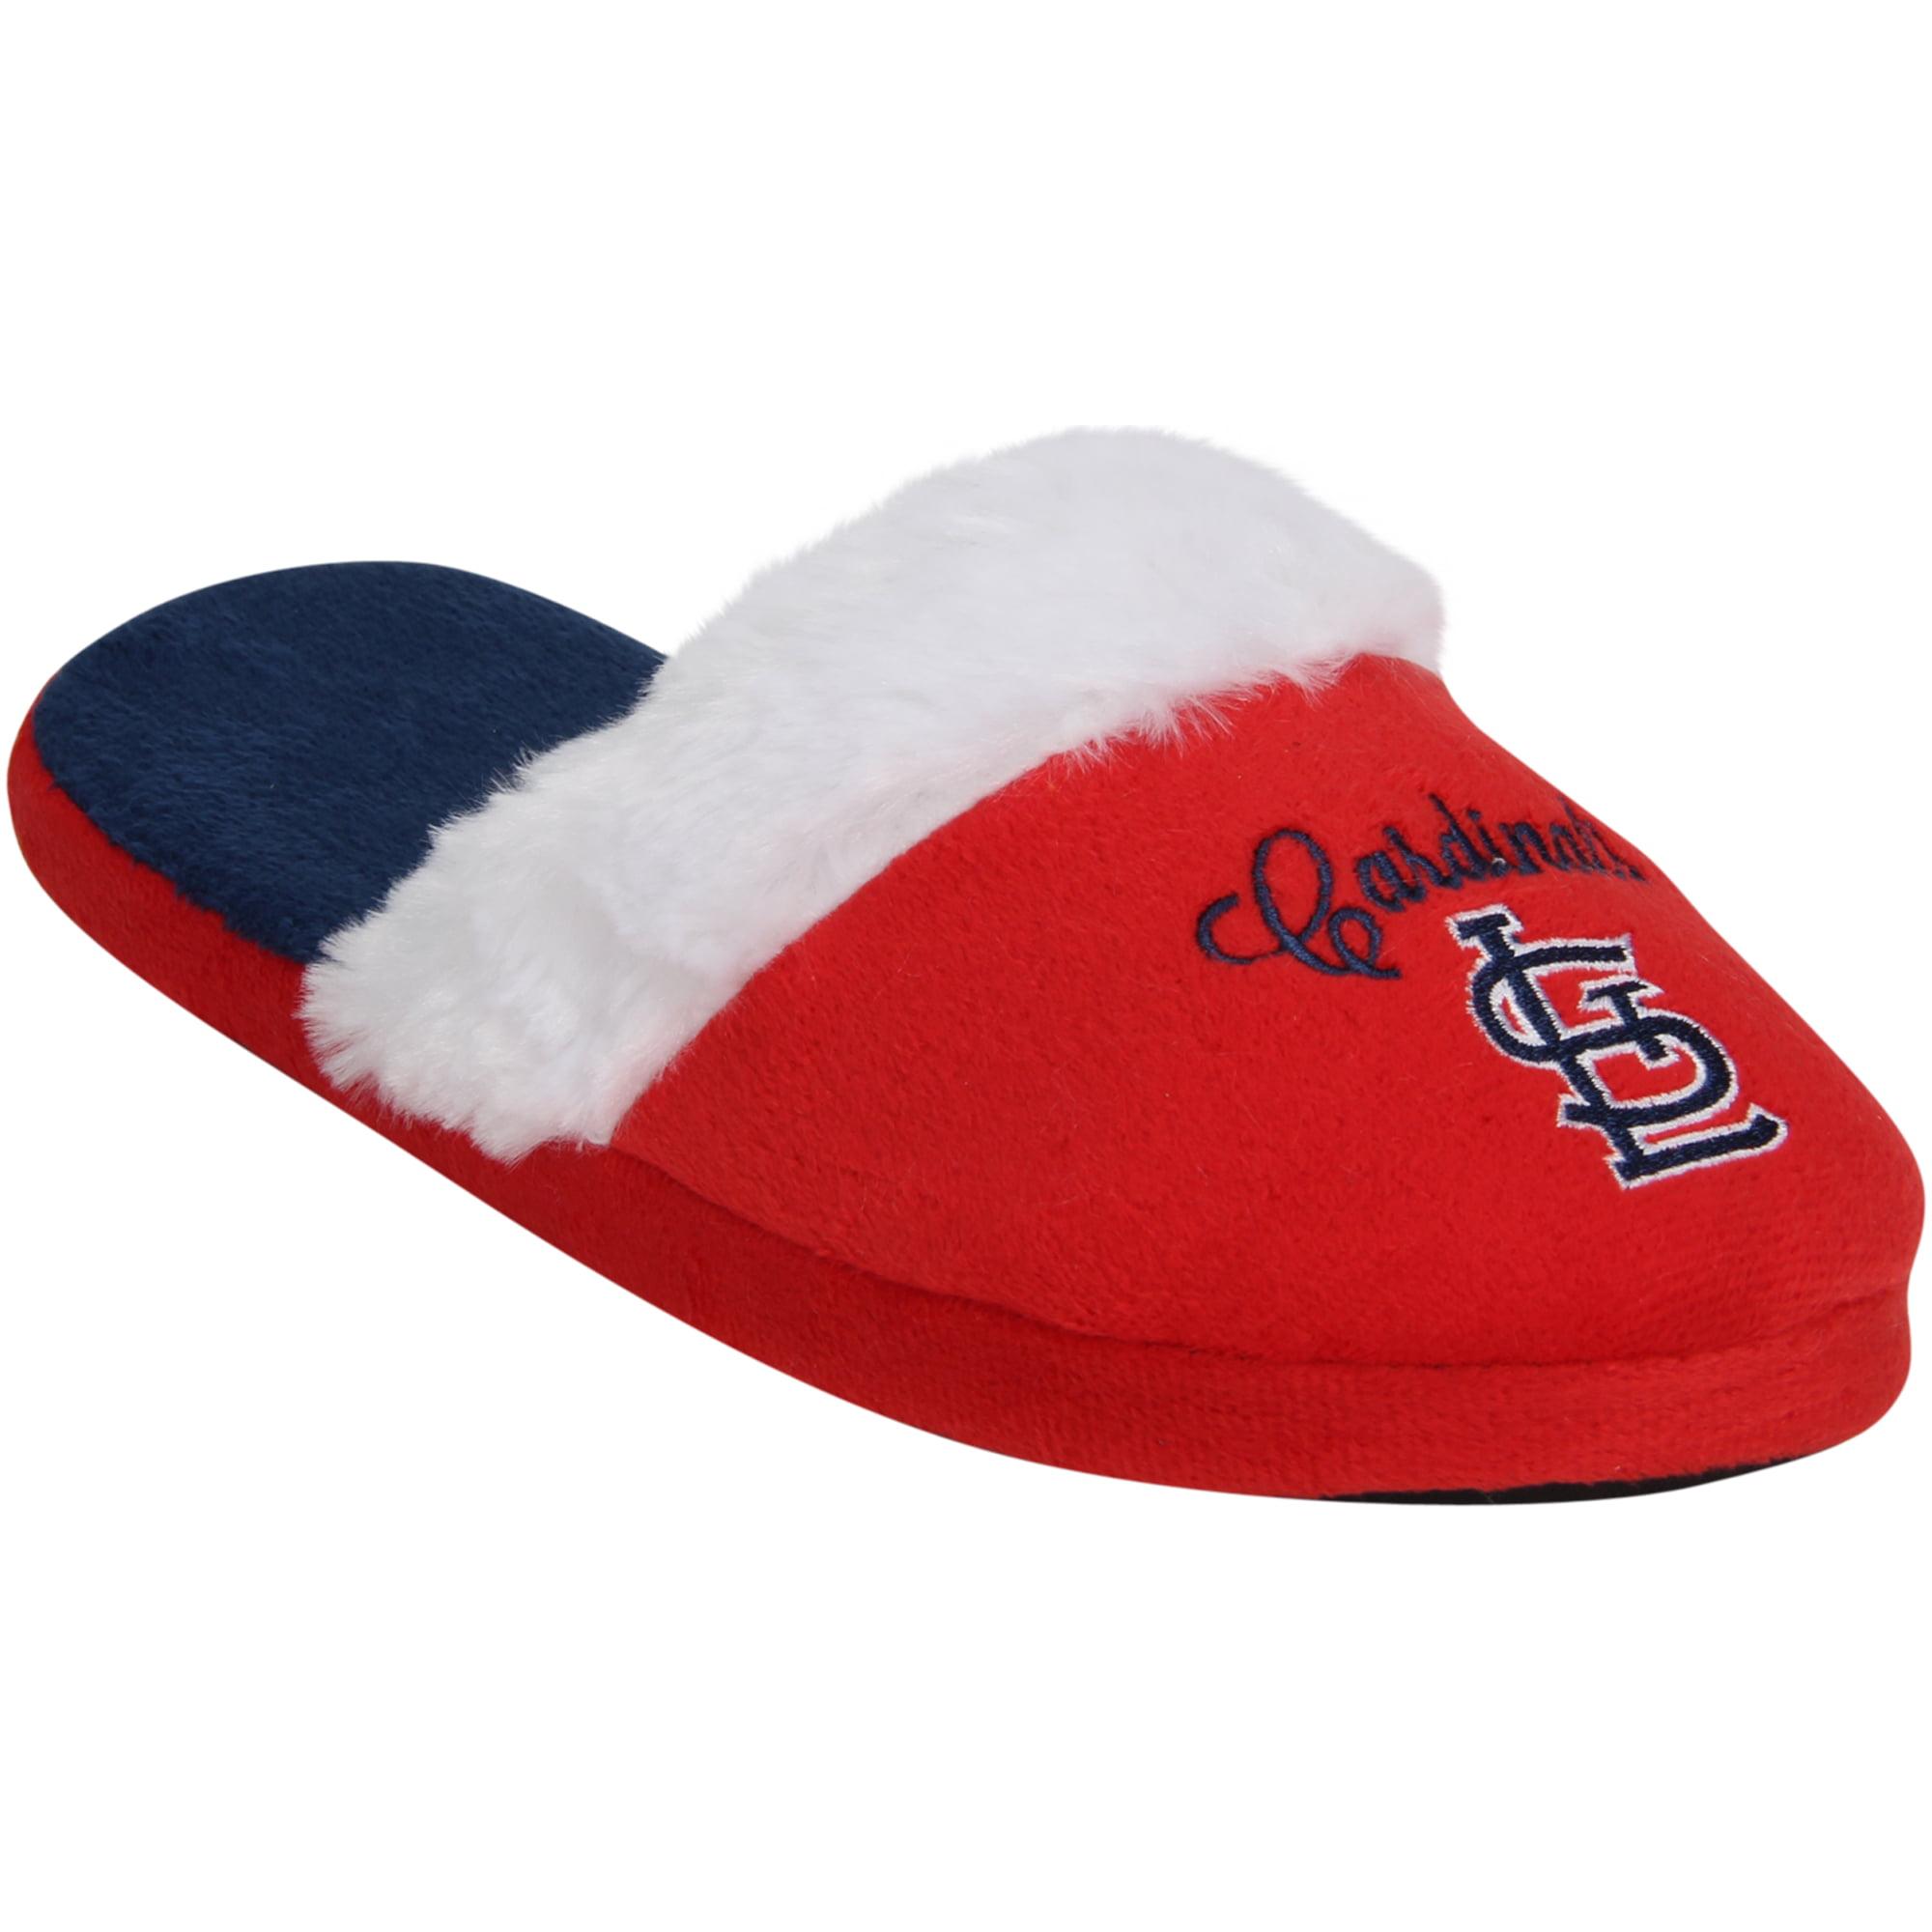 St. Louis Cardinals Women's Colorblock Fur Slide Slippers